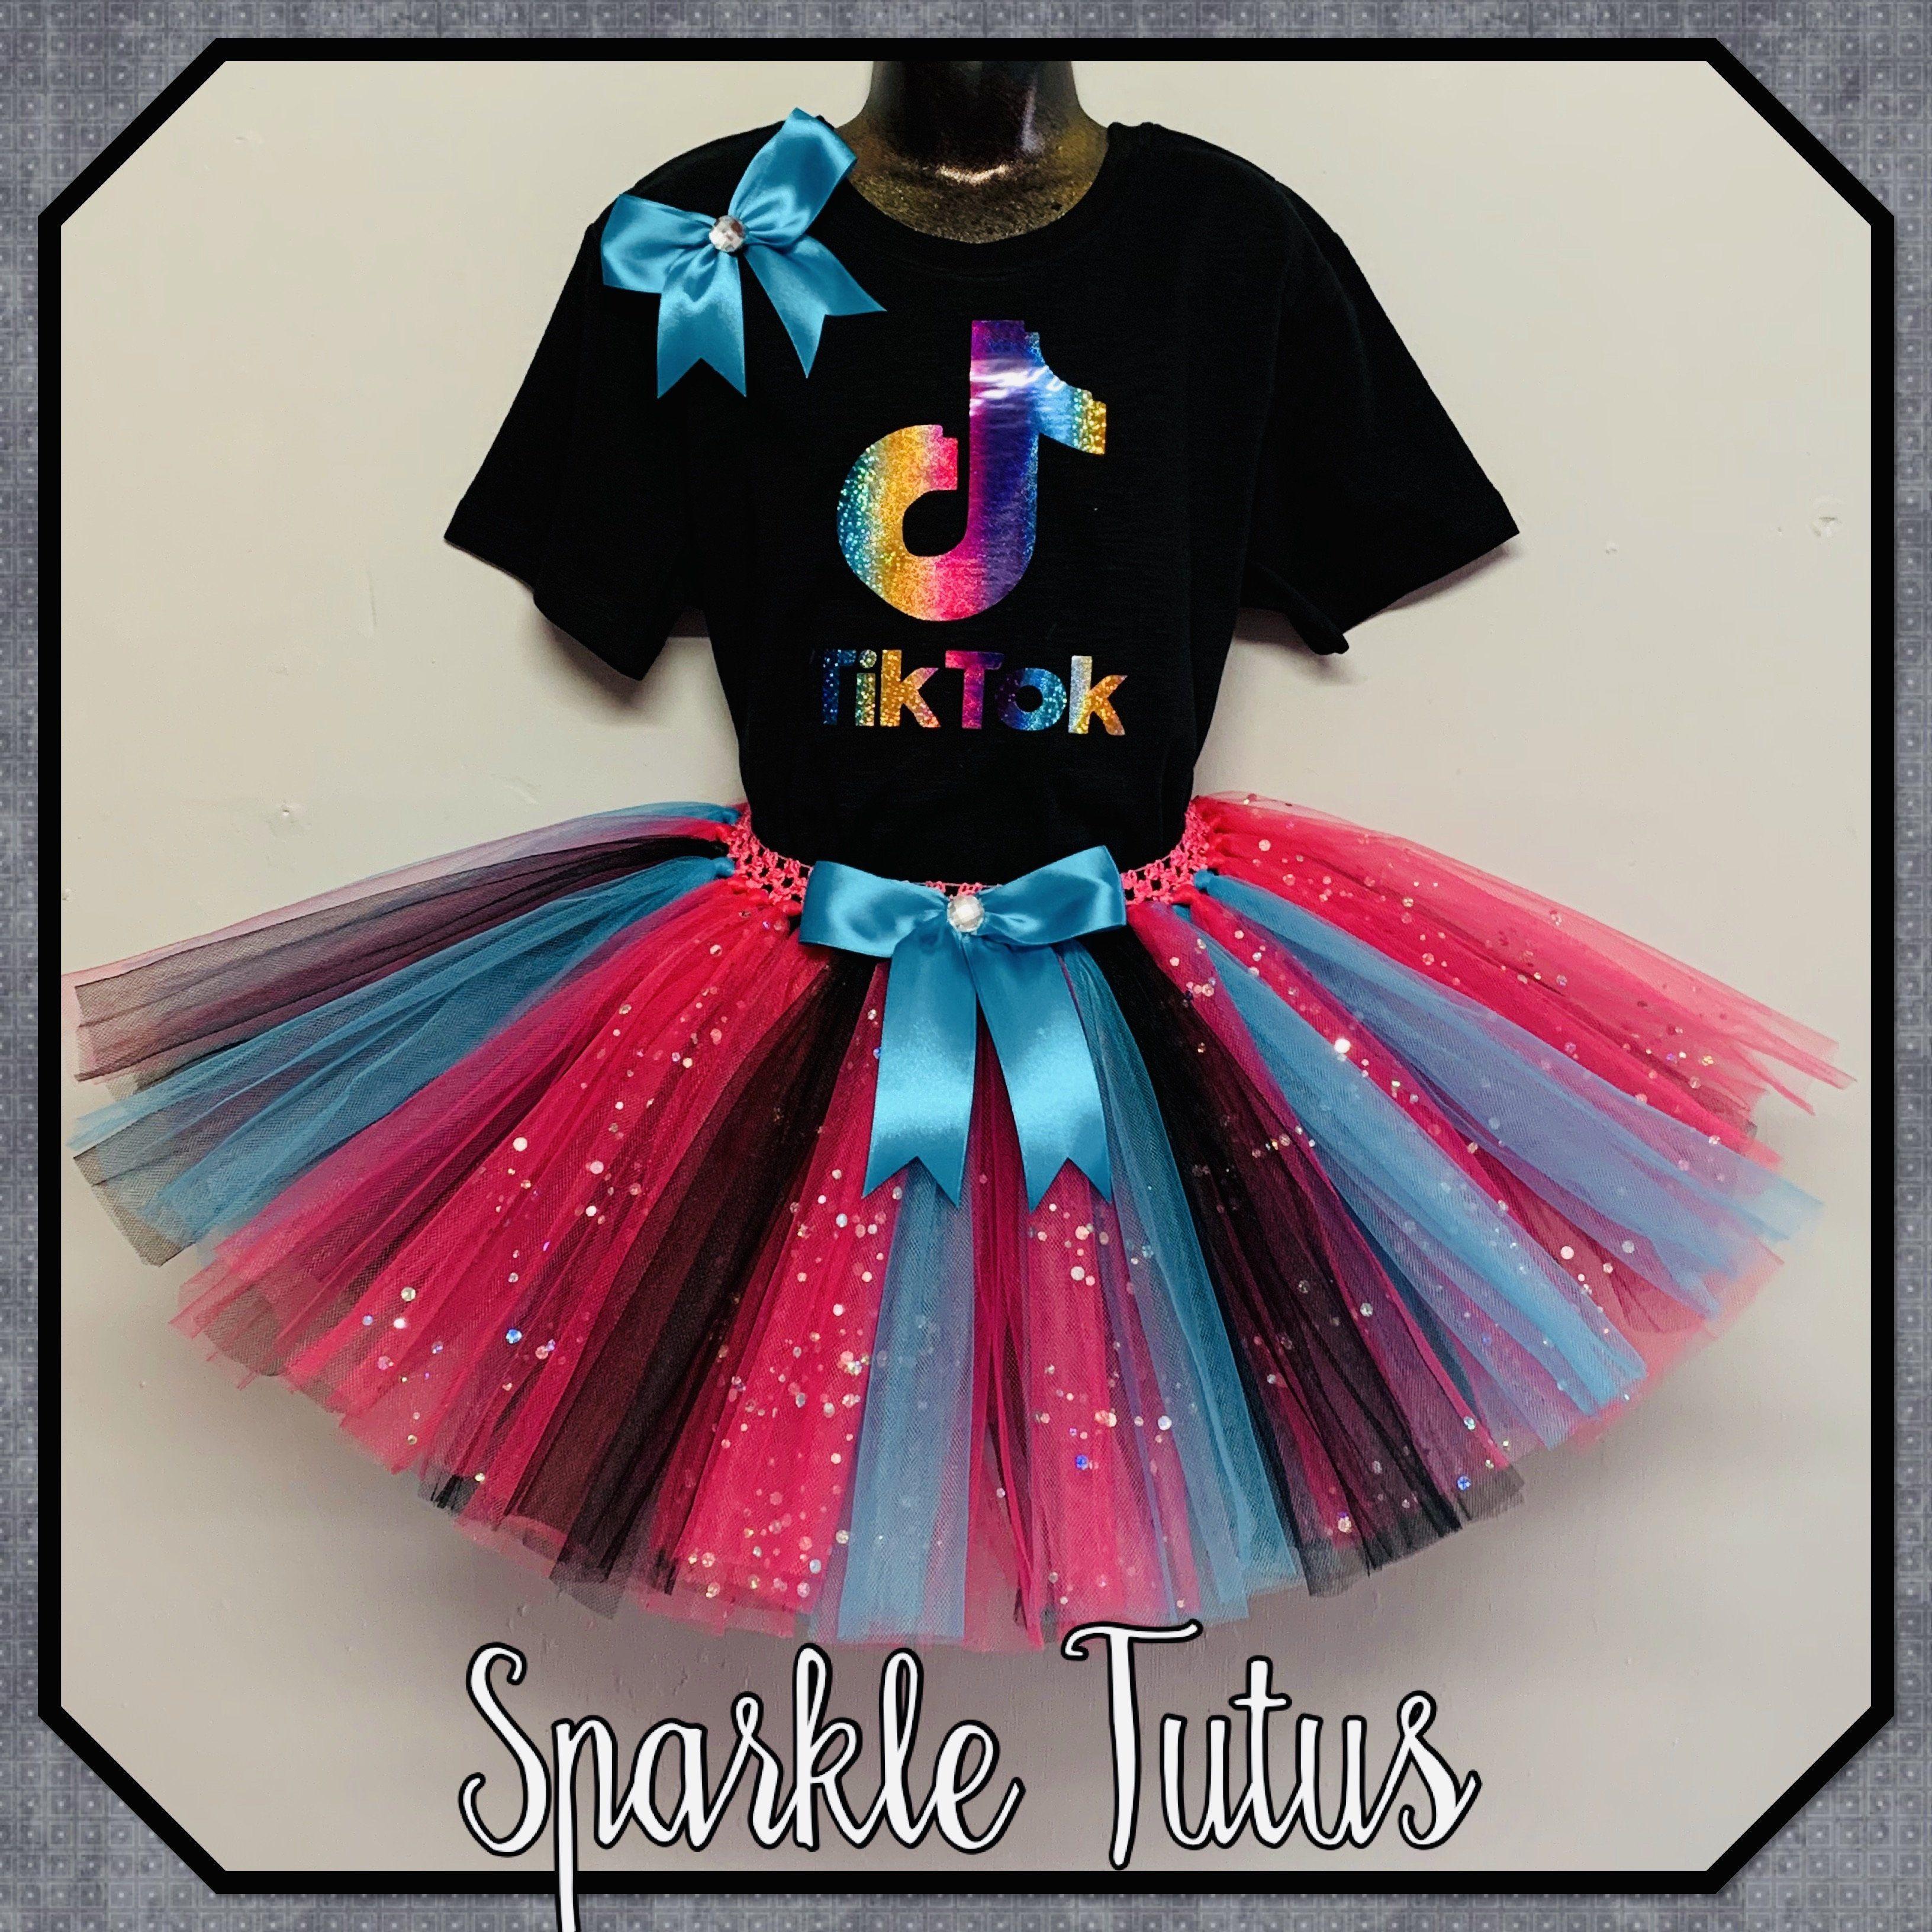 Tiktok Inspired Birthday Party Dance Tutu Outfit In 2021 Tutu Outfits Birthday Party Outfits Girls Birthday Party Themes